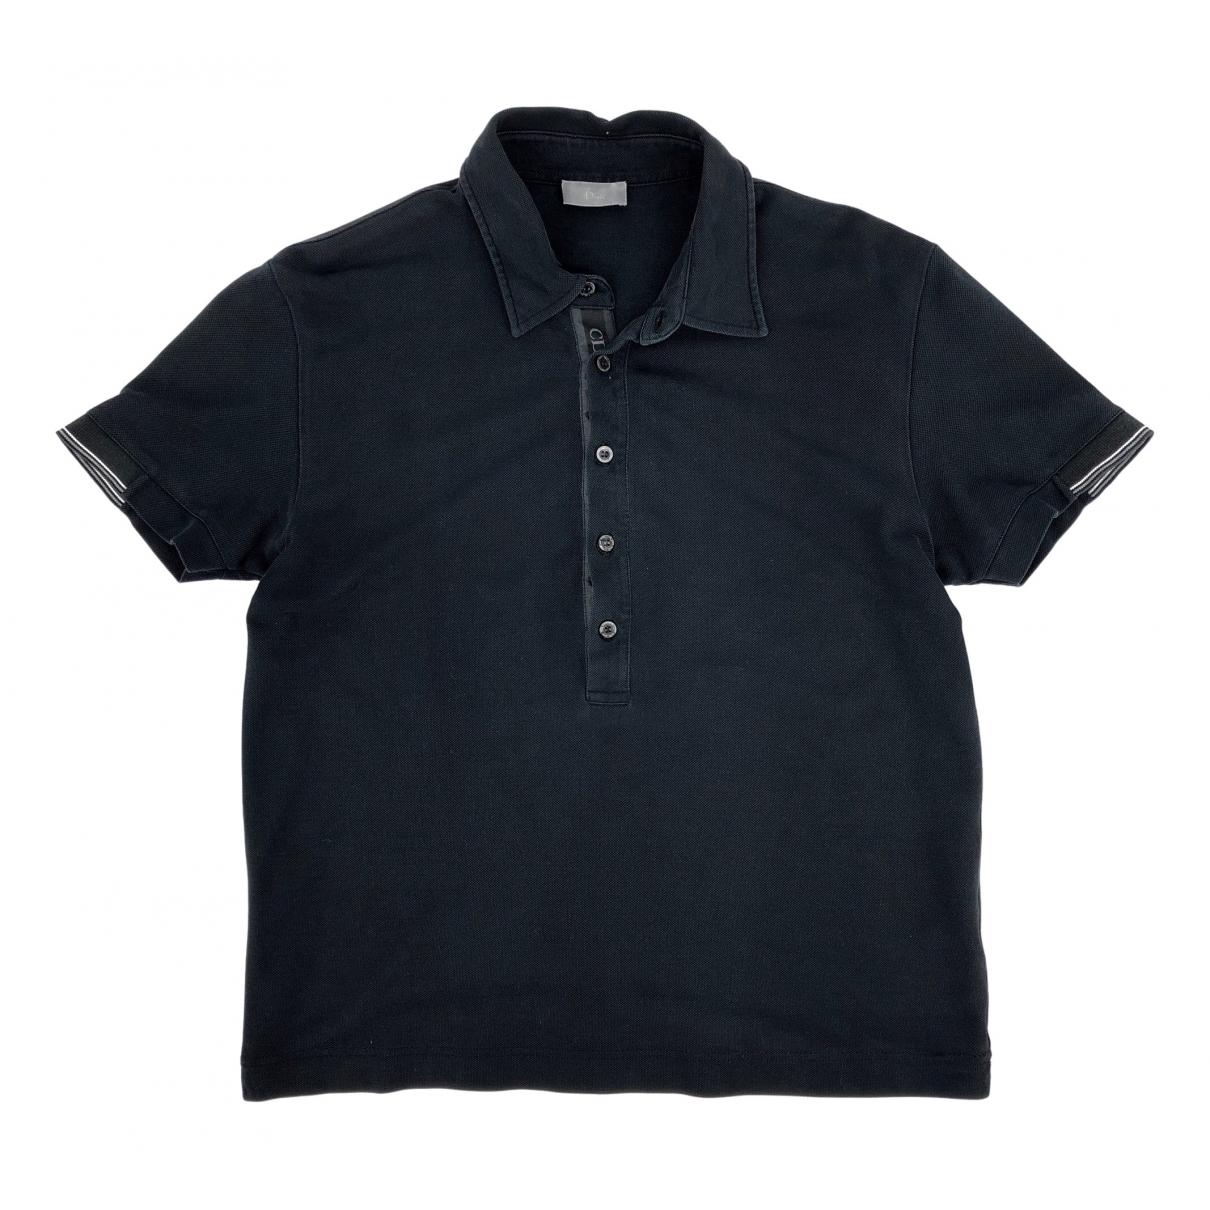 Dior \N Black Cotton Polo shirts for Men S International